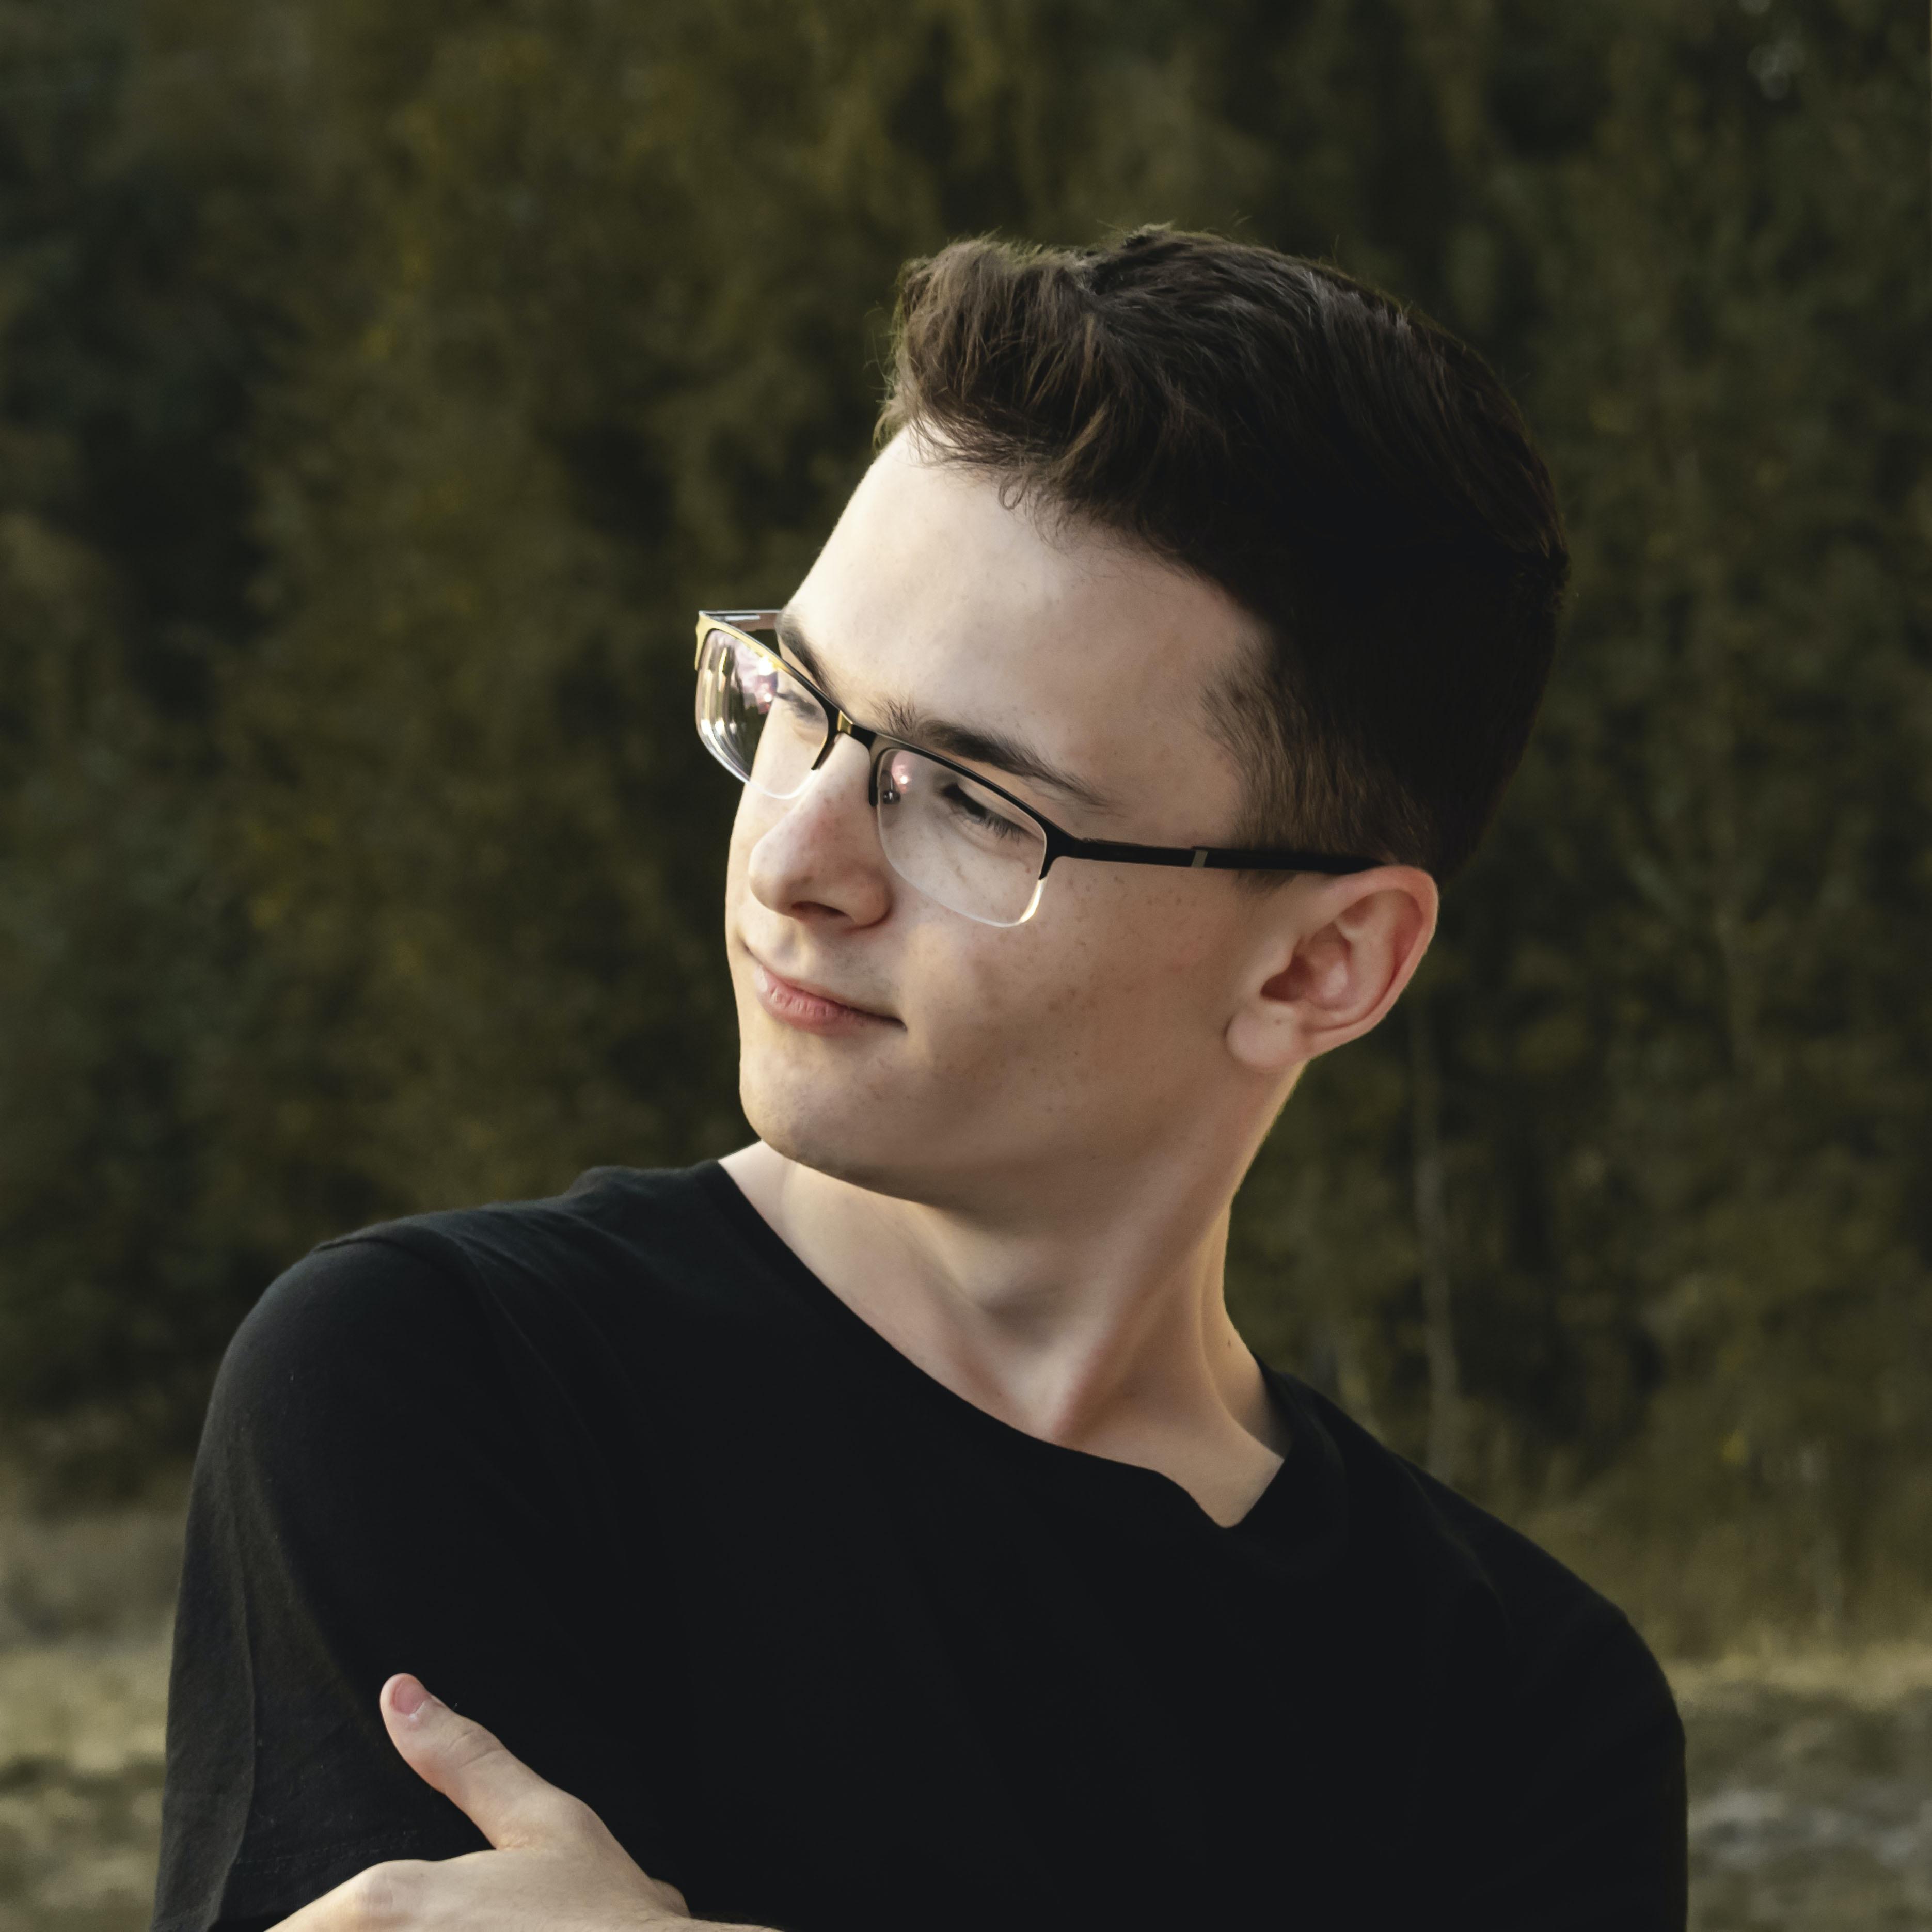 Go to Mateusz Buda's profile